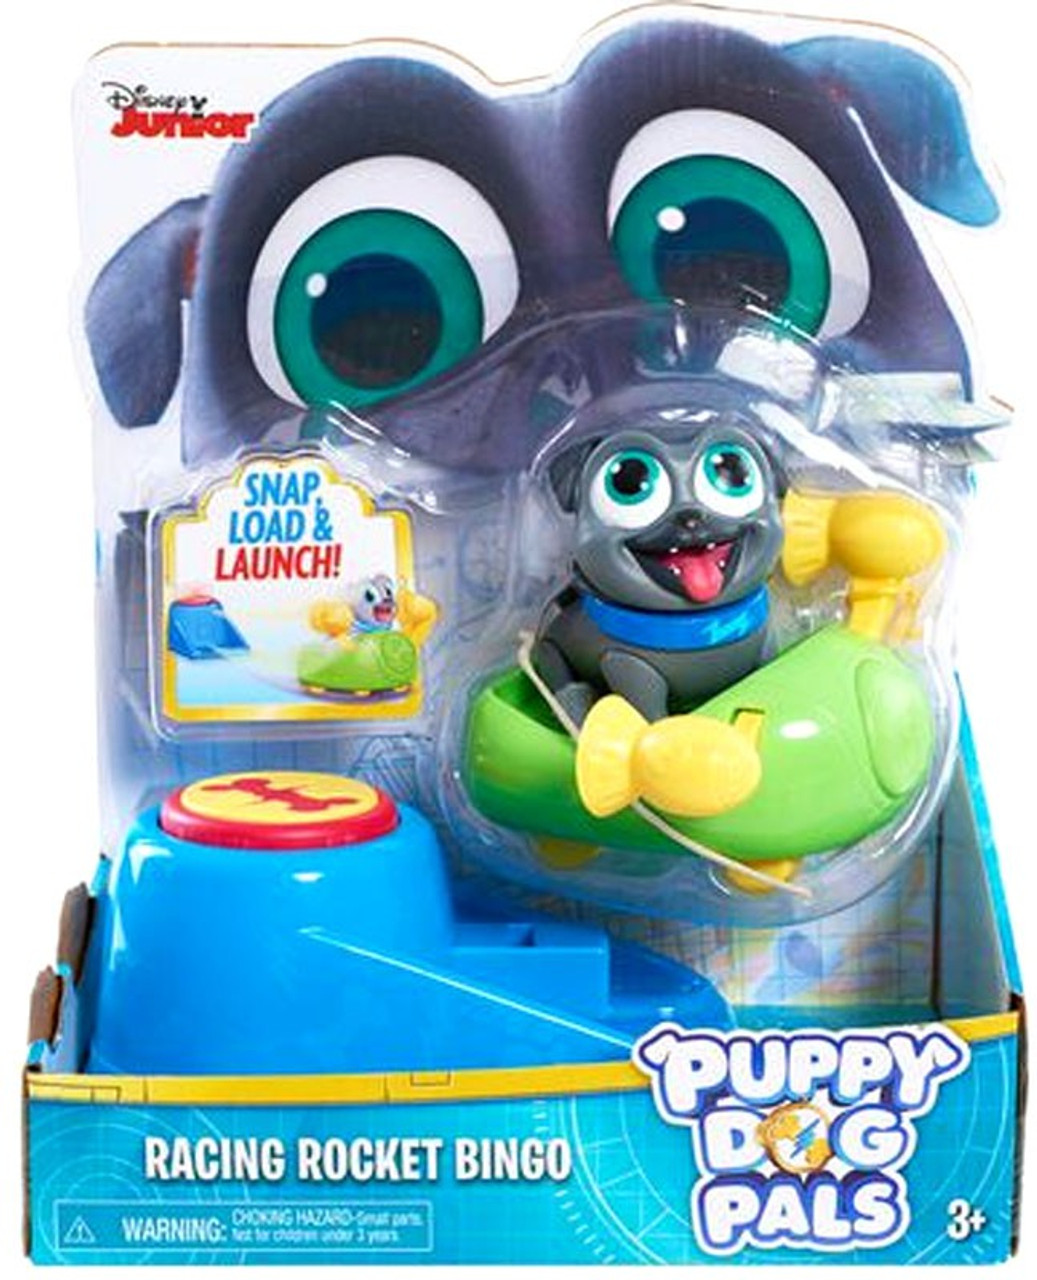 f8cb5163ba2 Disney Junior Puppy Dog Pals Racing Rocket Bingo Action Figure Just Play -  ToyWiz